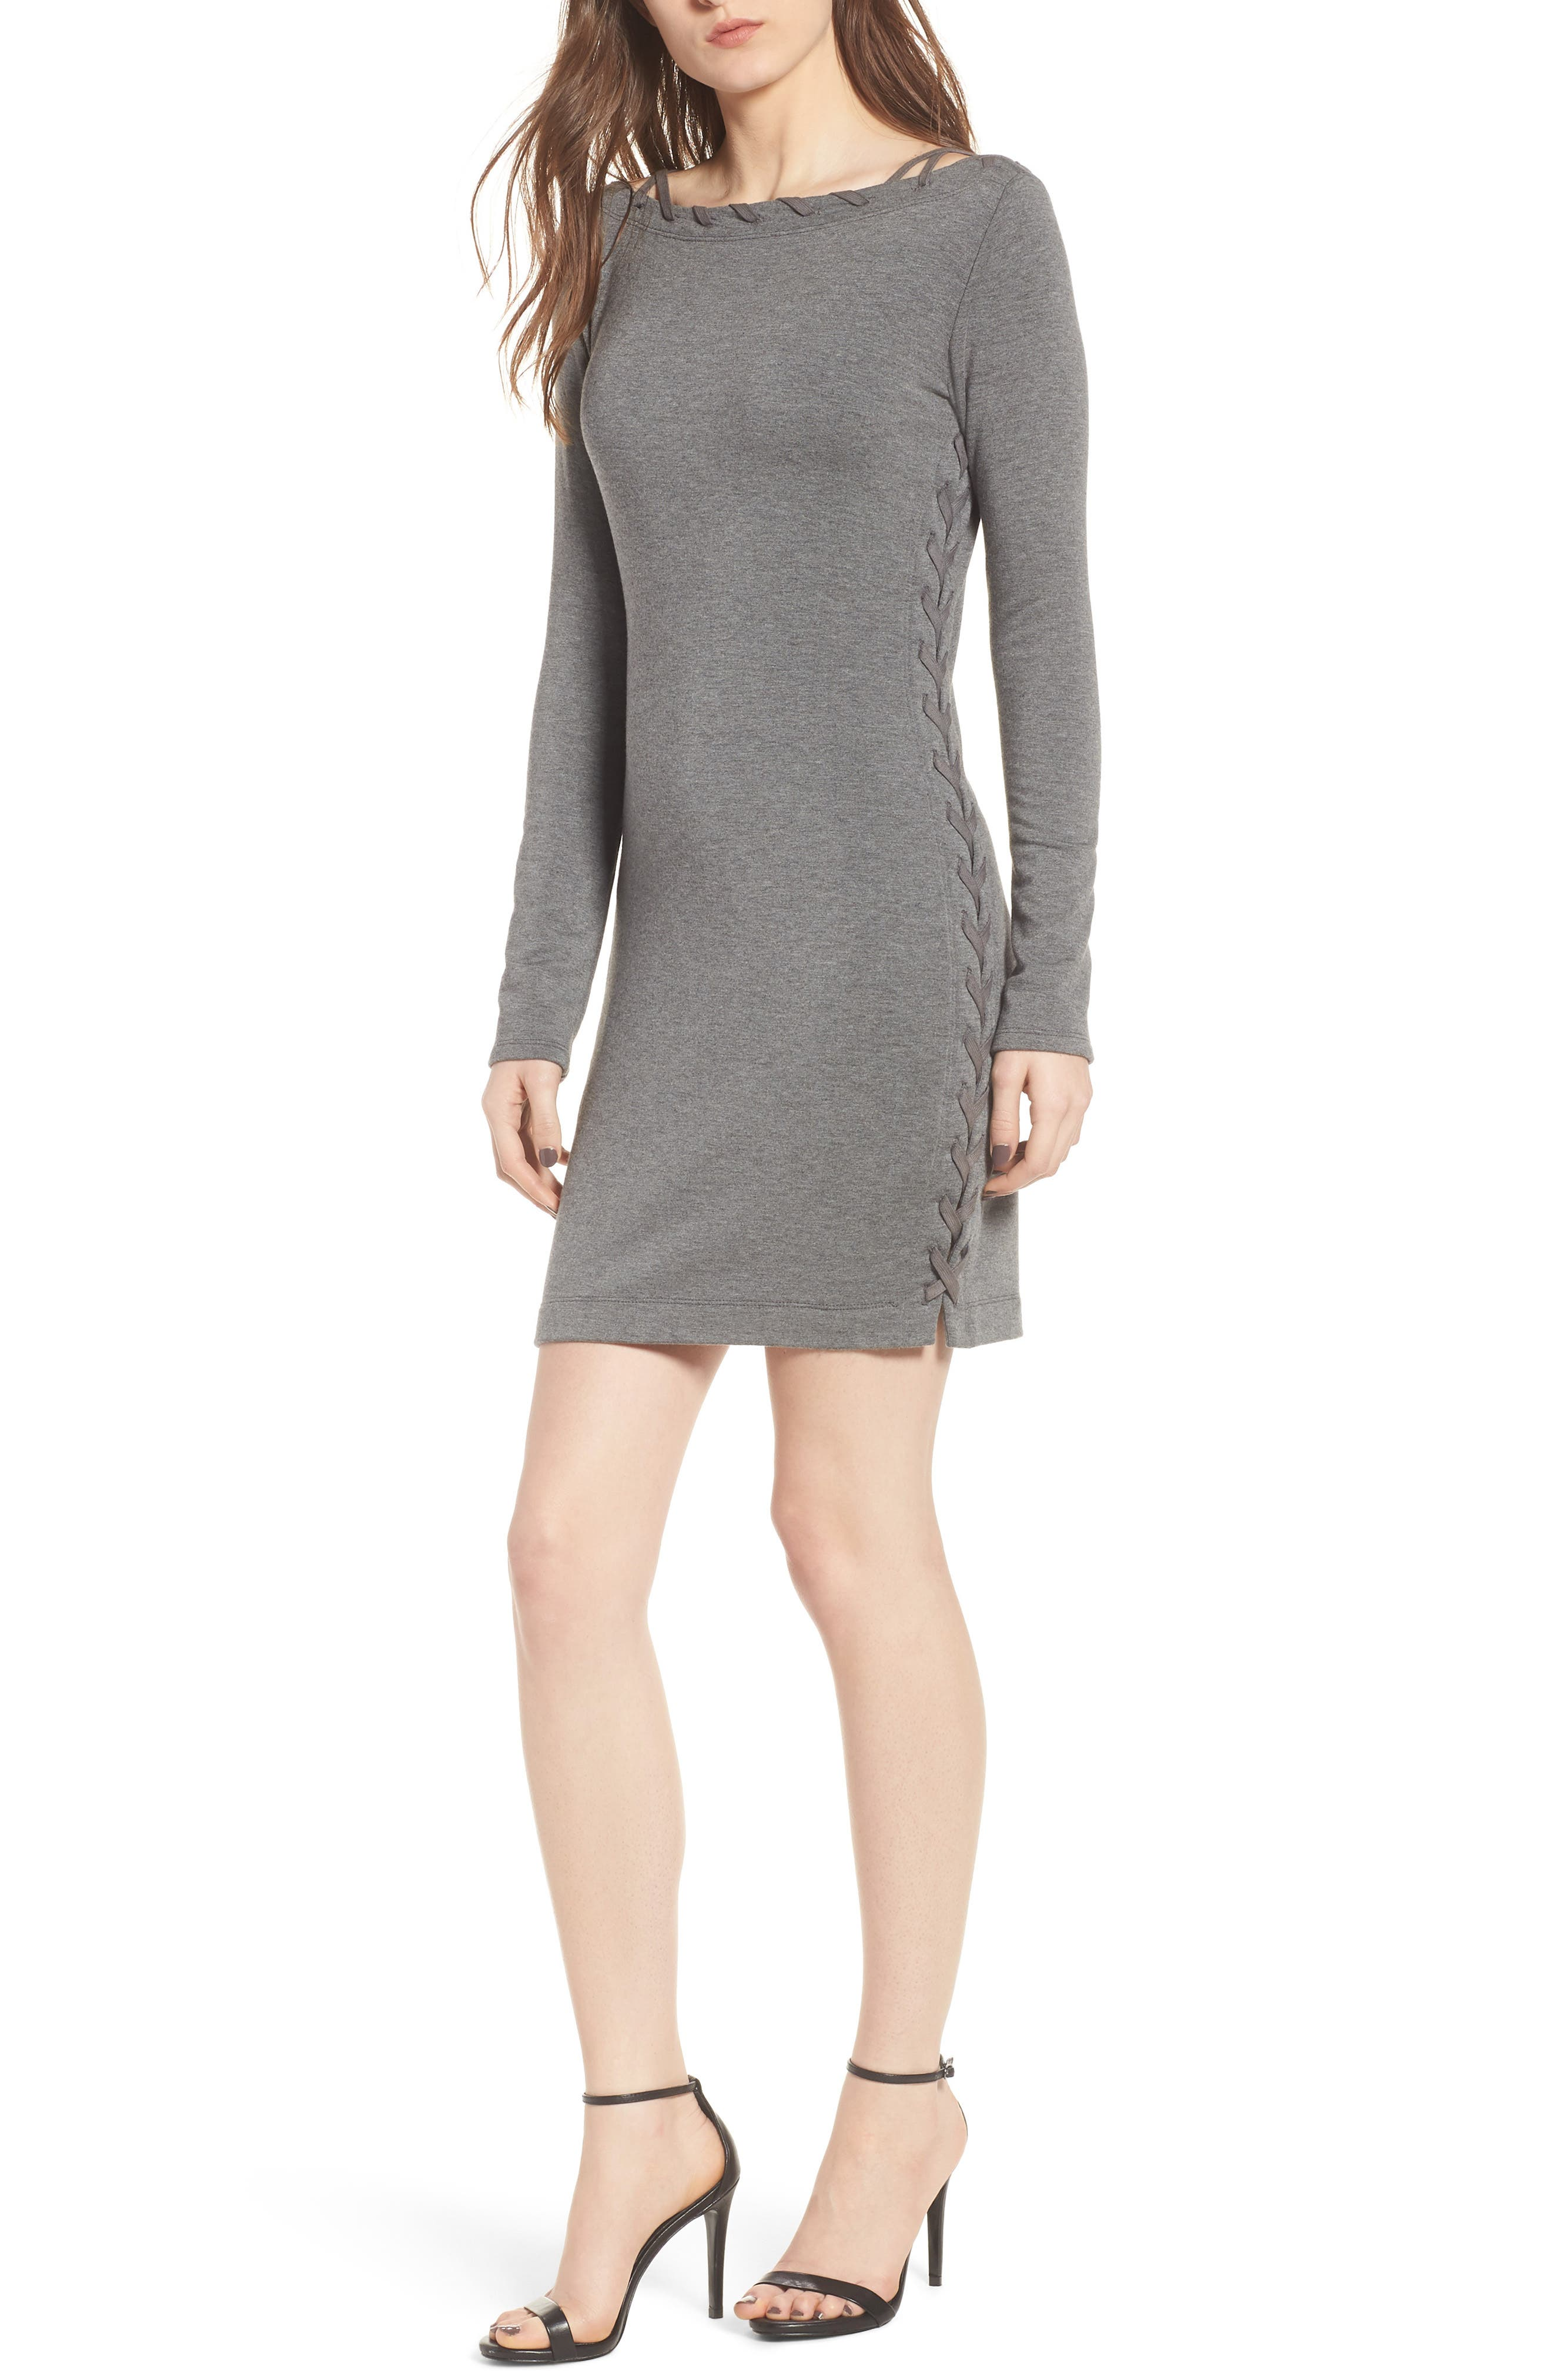 Lazy Day Minidress,                         Main,                         color, Marengo